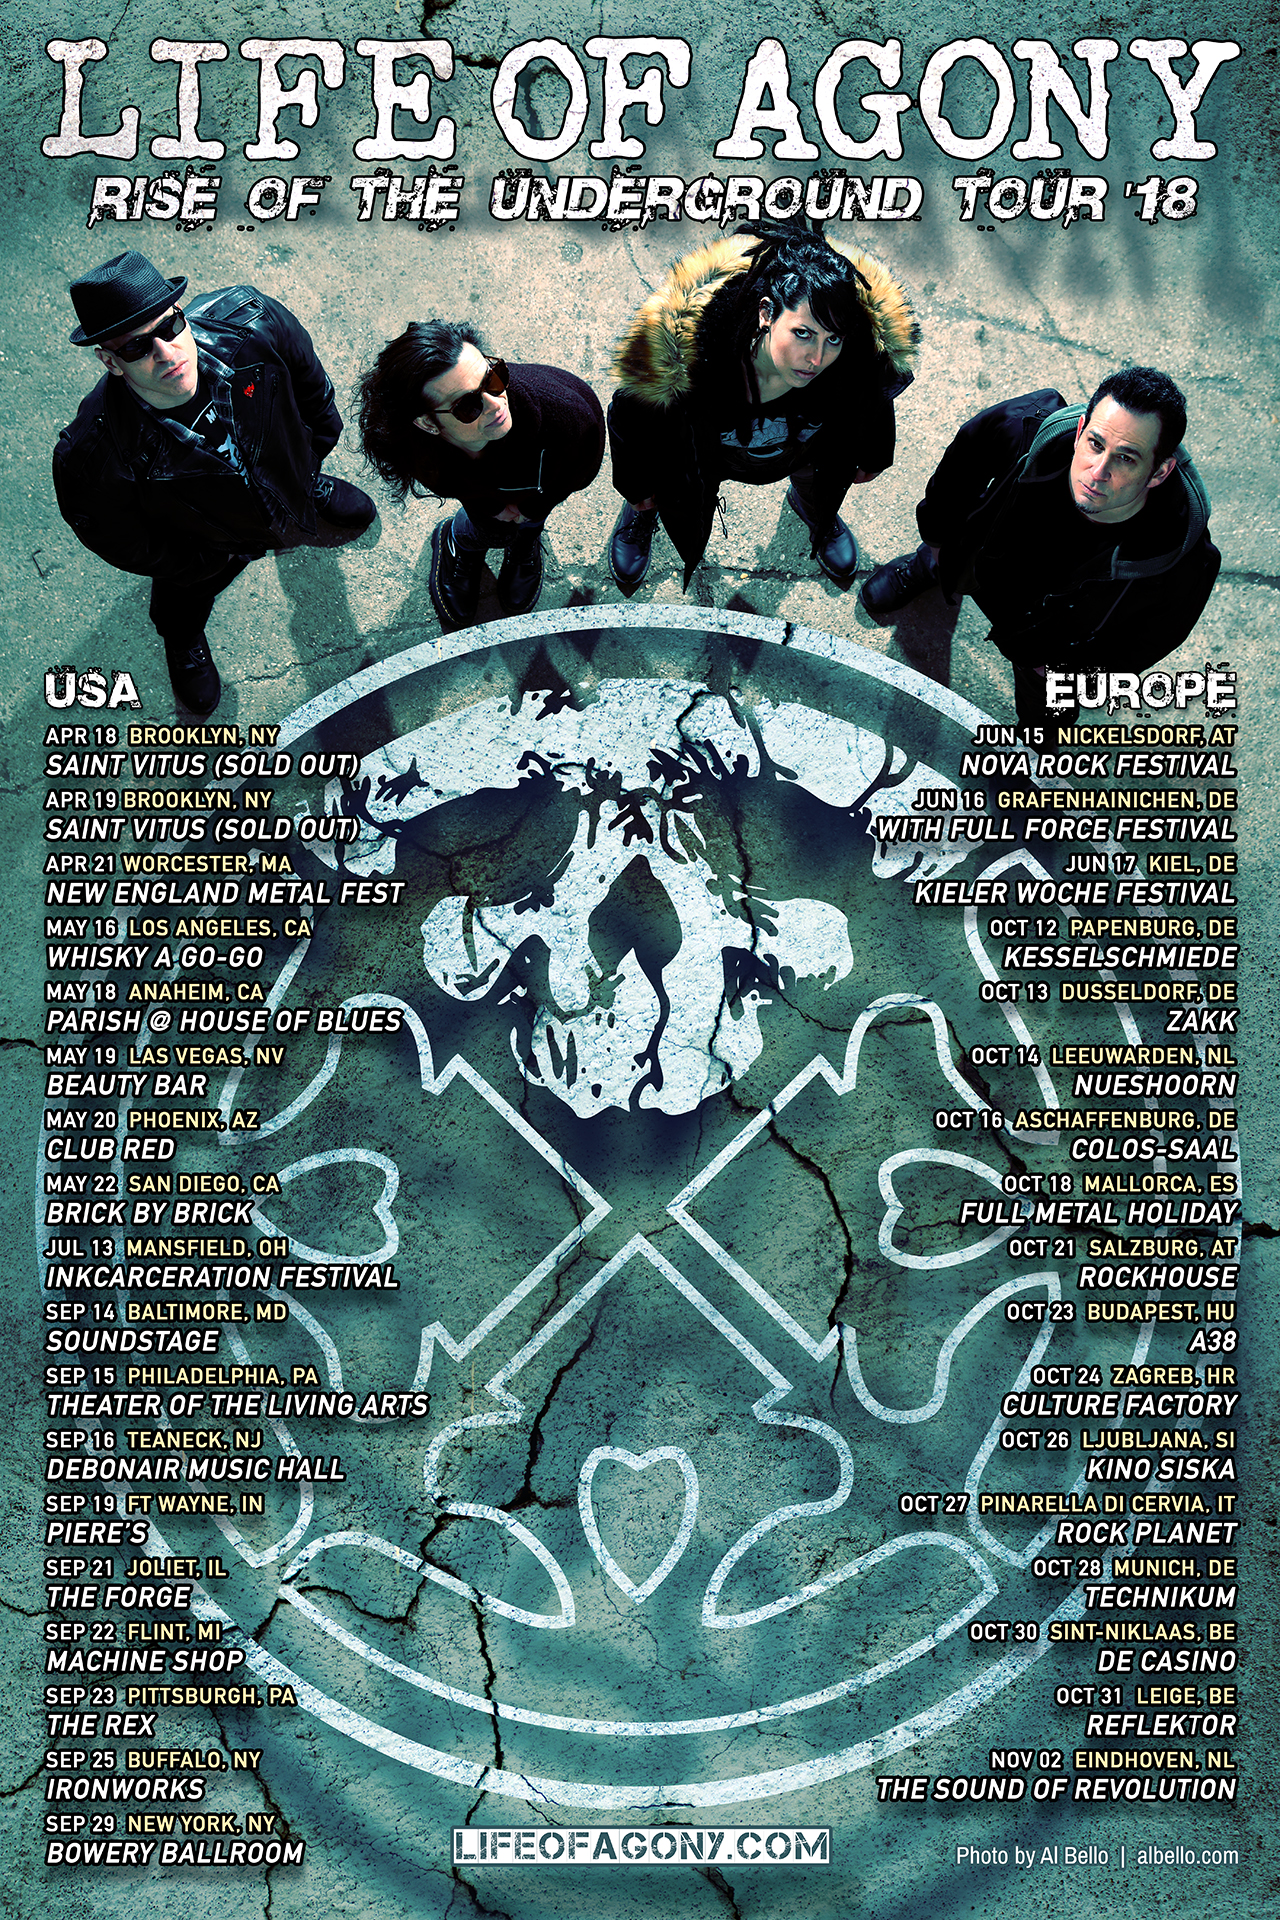 LOA-Rise-of-the-Underground-Tour-2018-Admat-Web-Quality.jpg